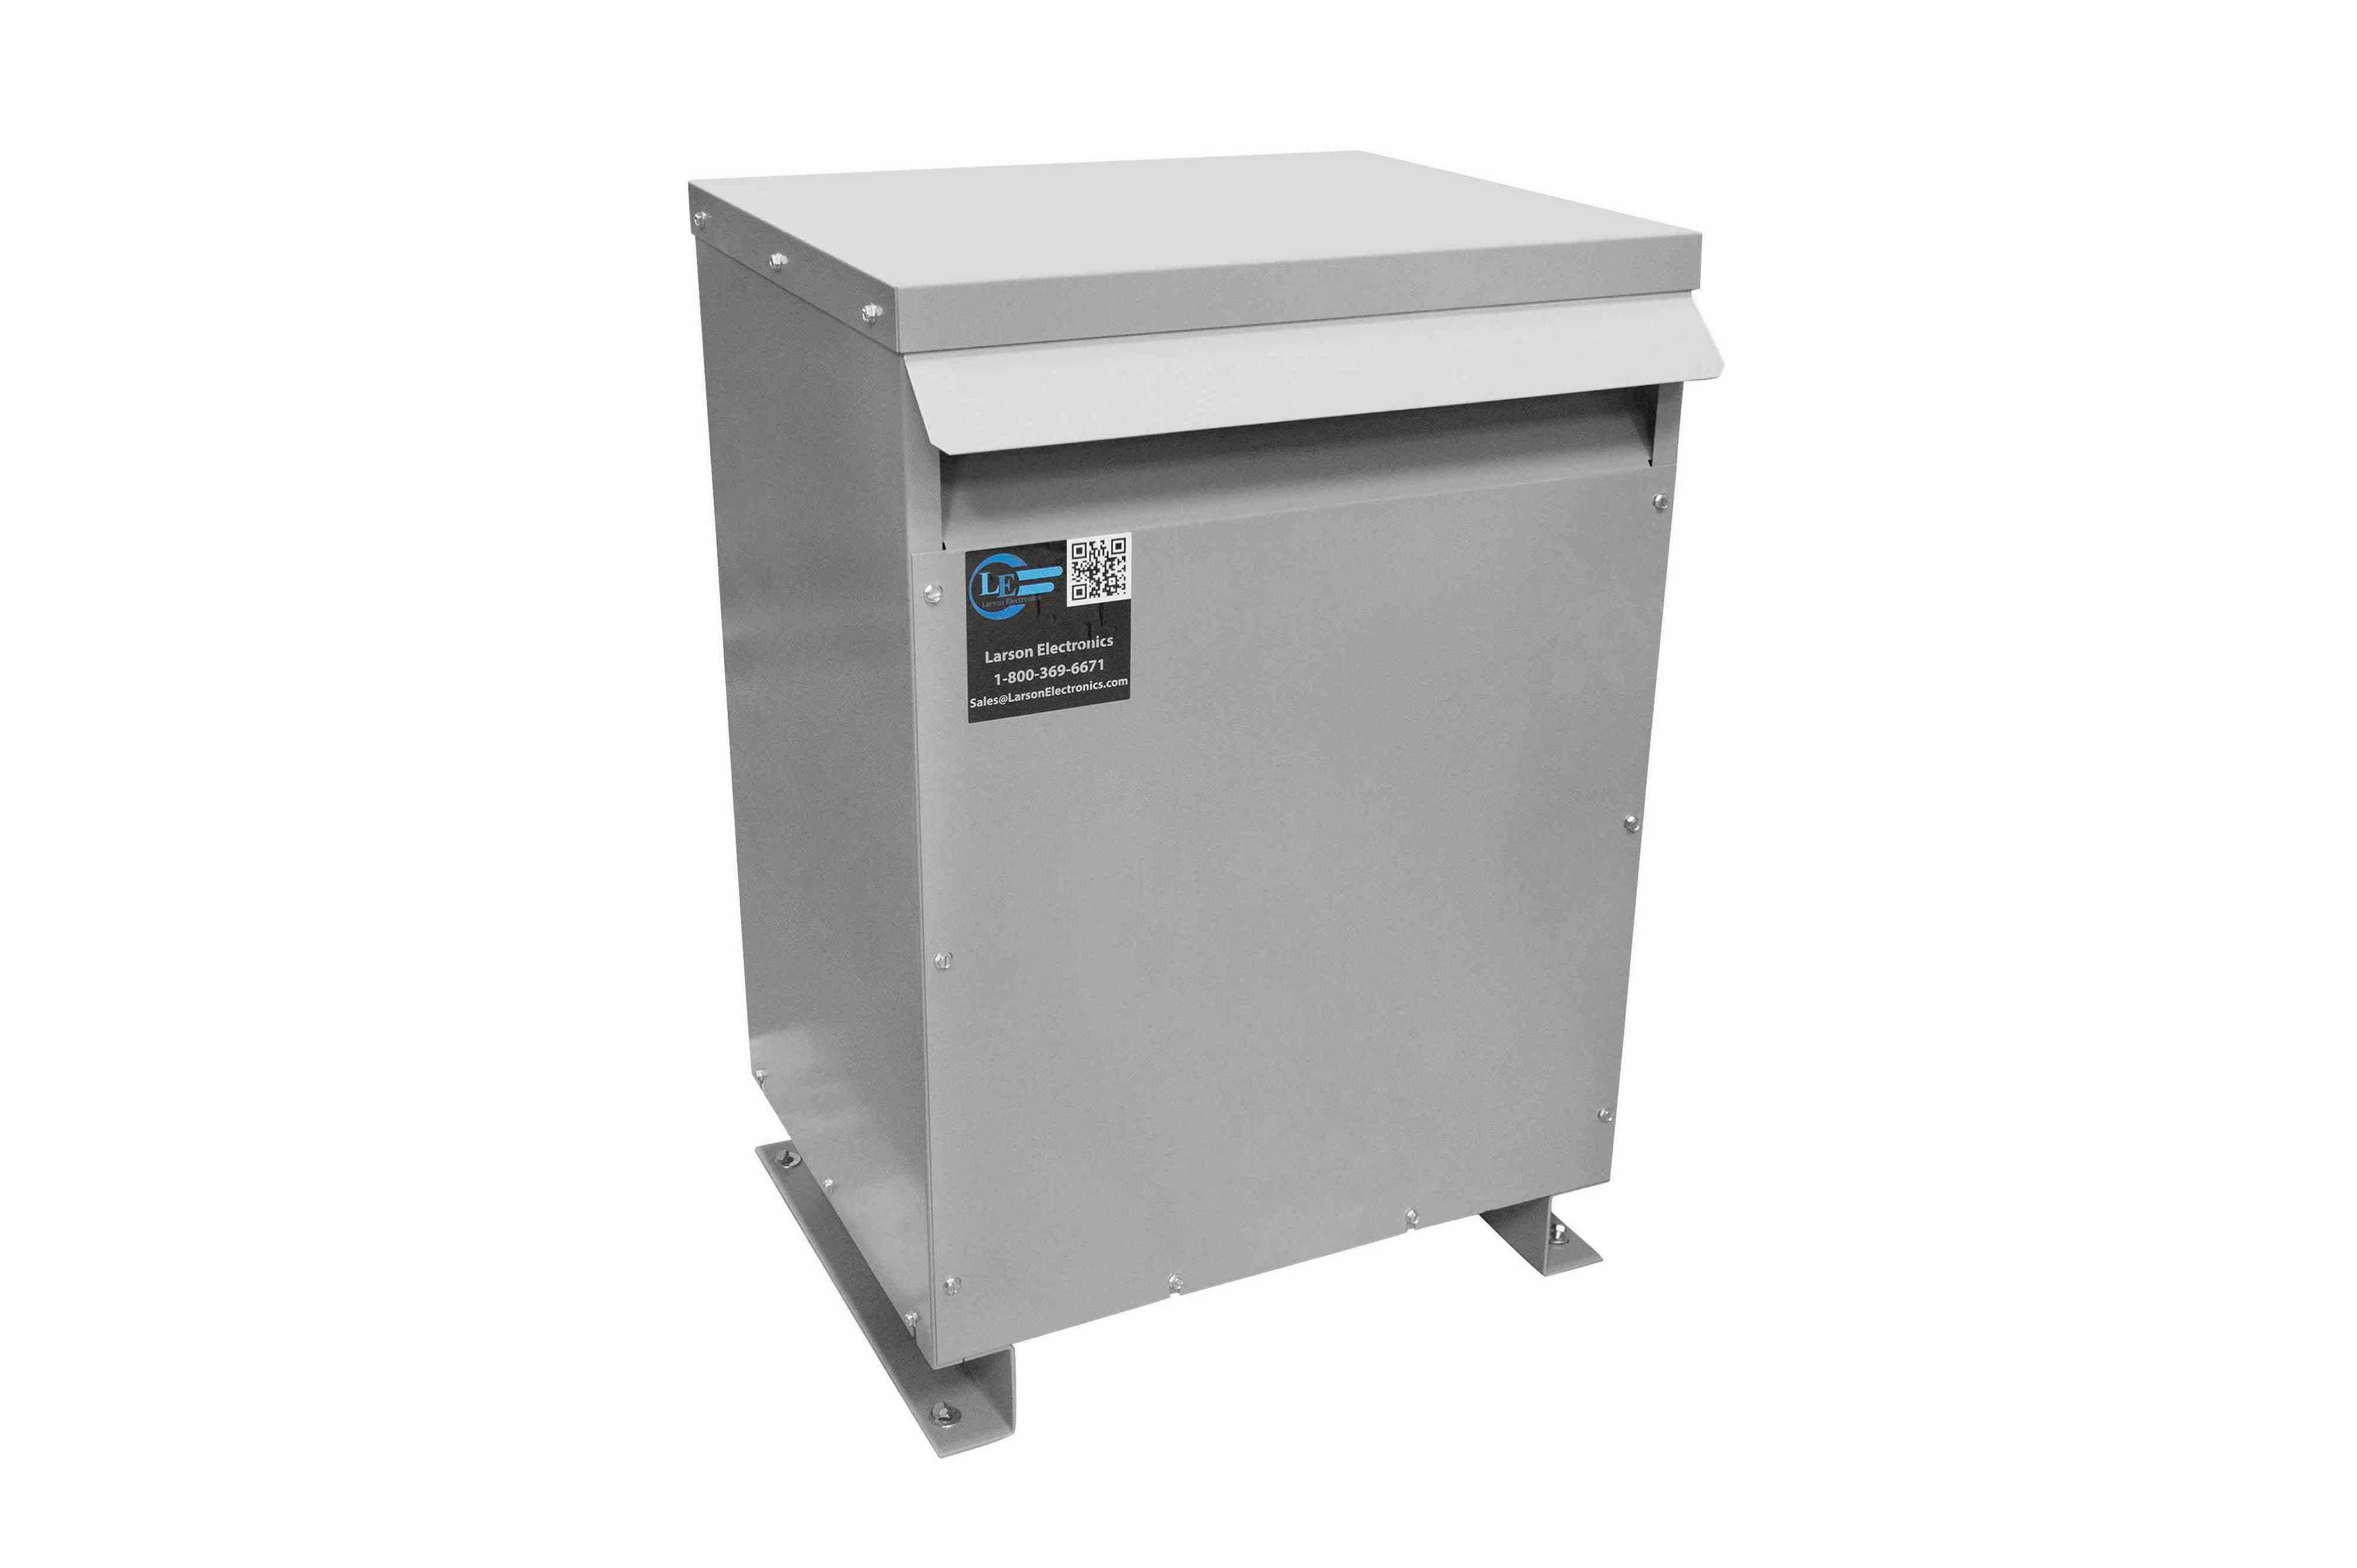 22.5 kVA 3PH Isolation Transformer, 208V Wye Primary, 380Y/220 Wye-N Secondary, N3R, Ventilated, 60 Hz